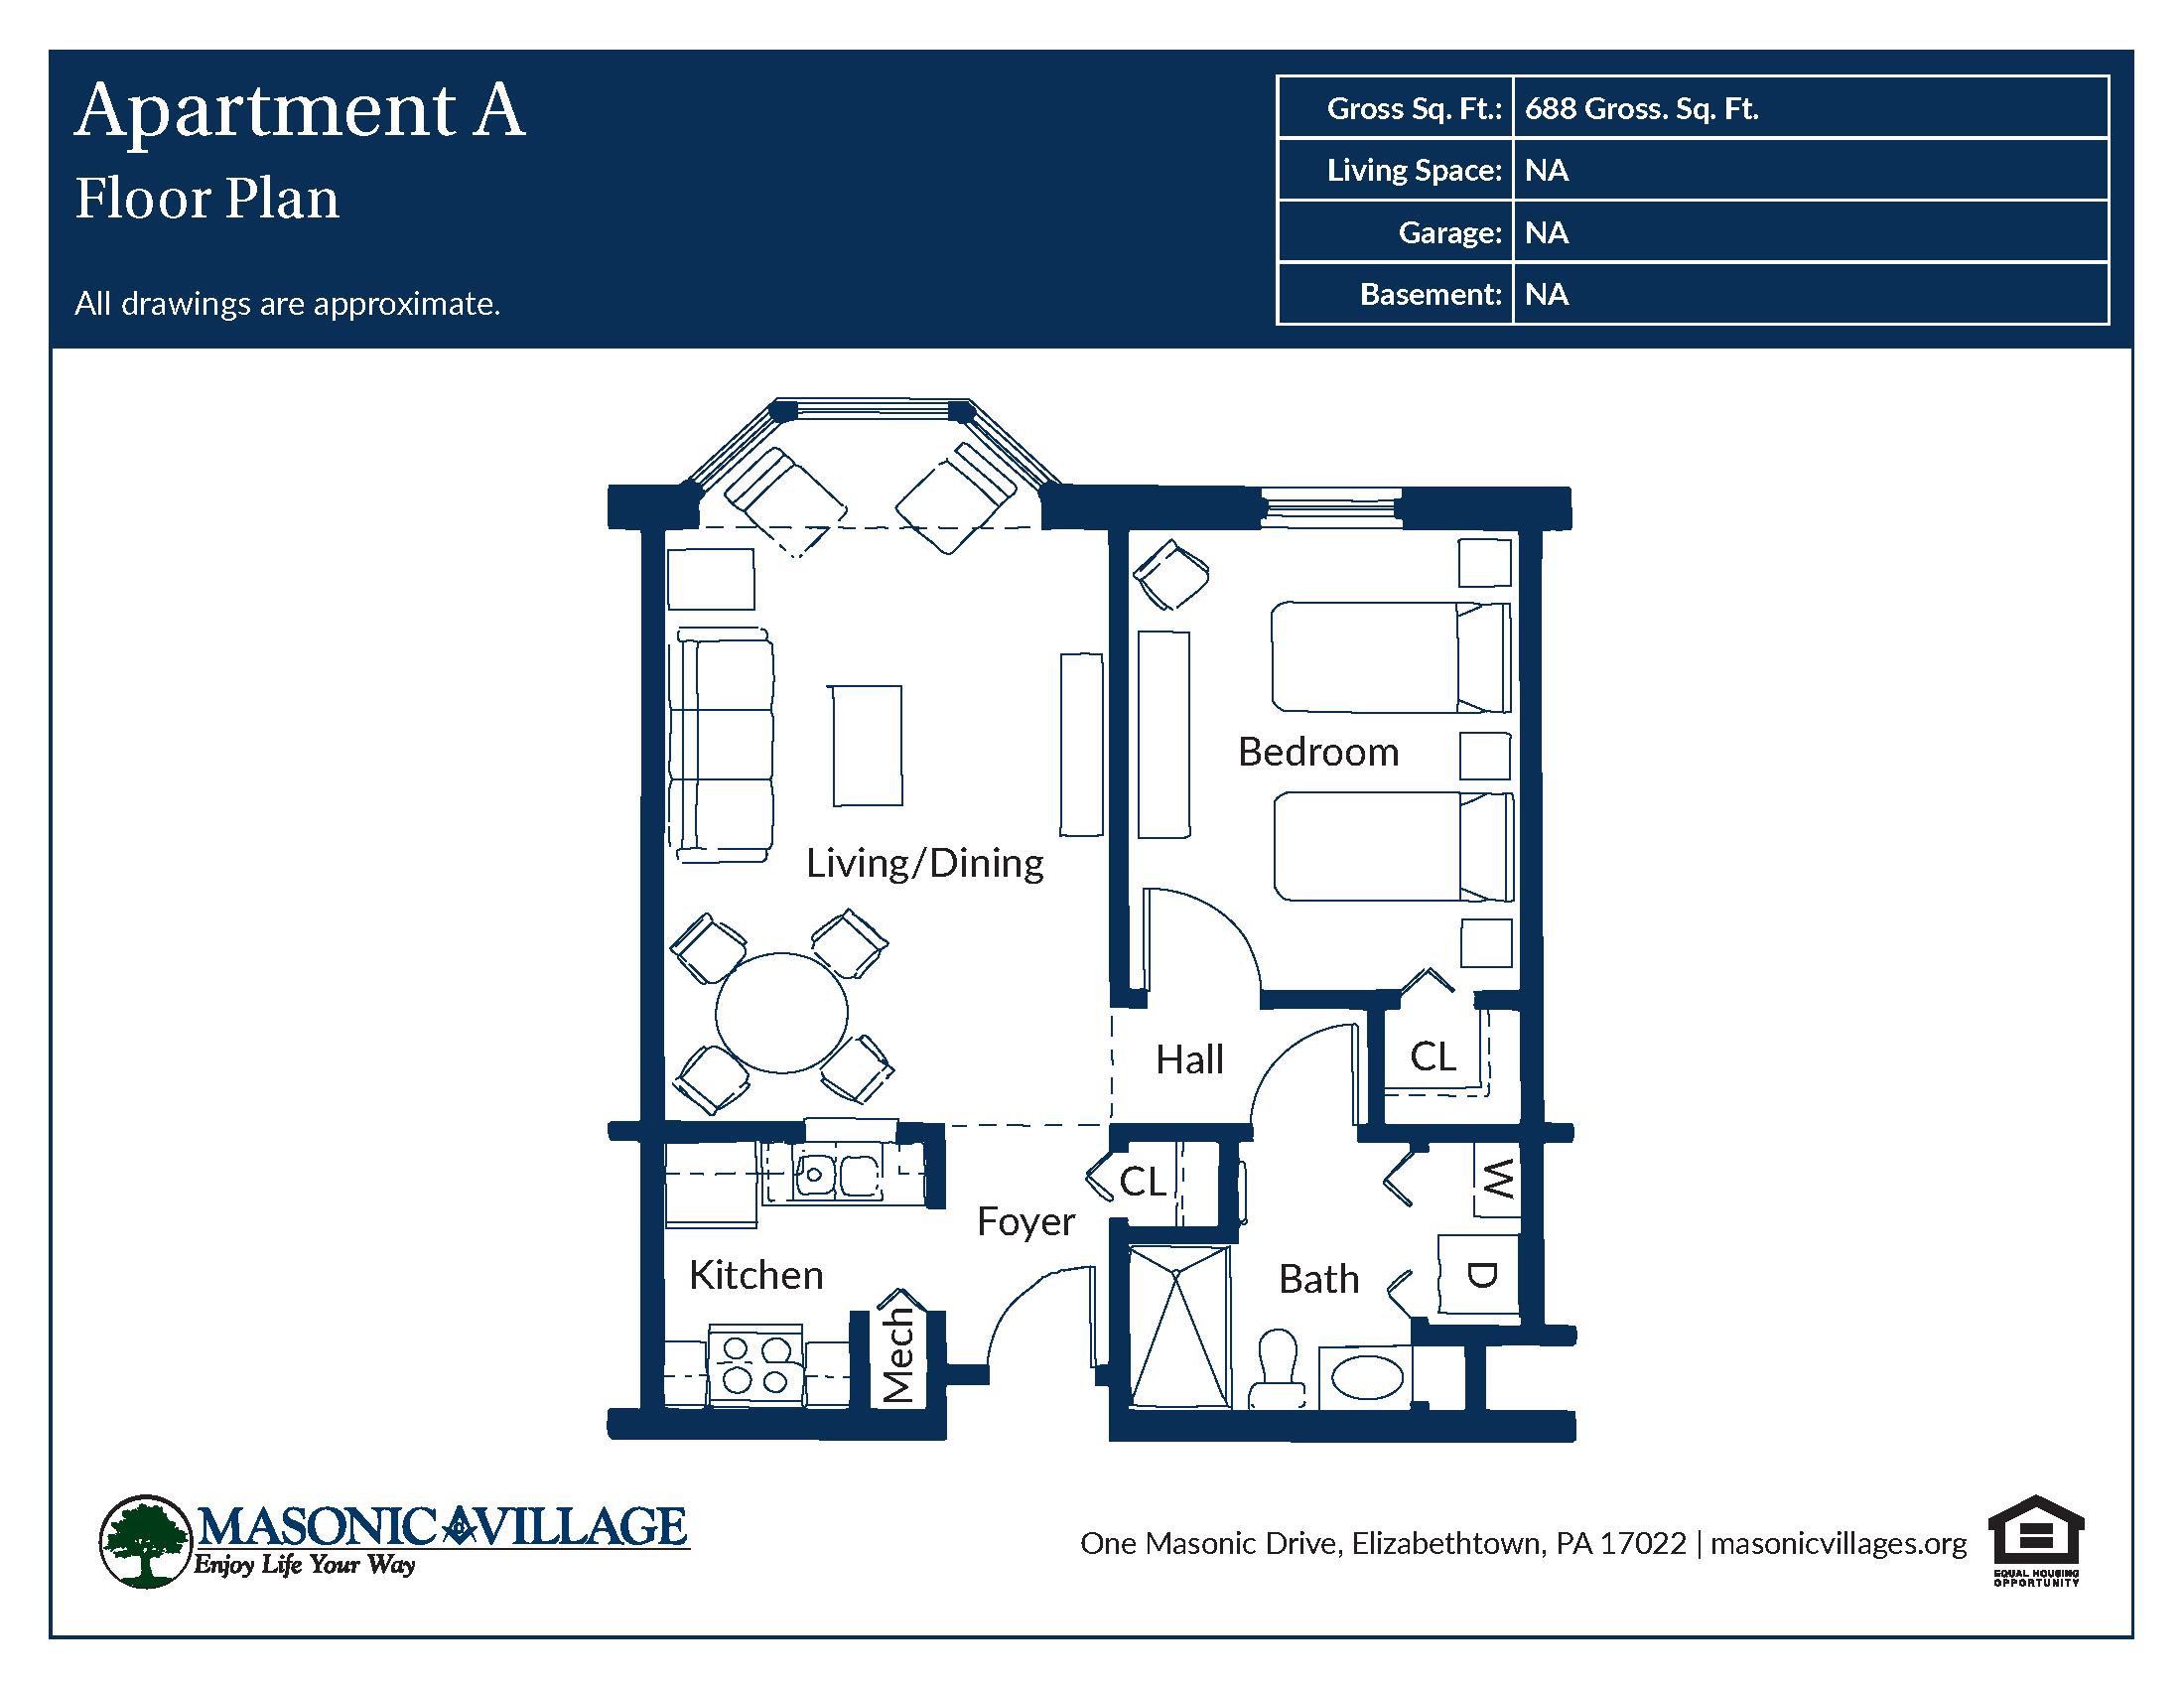 Masonic Village at Elizabethtown - Apartment